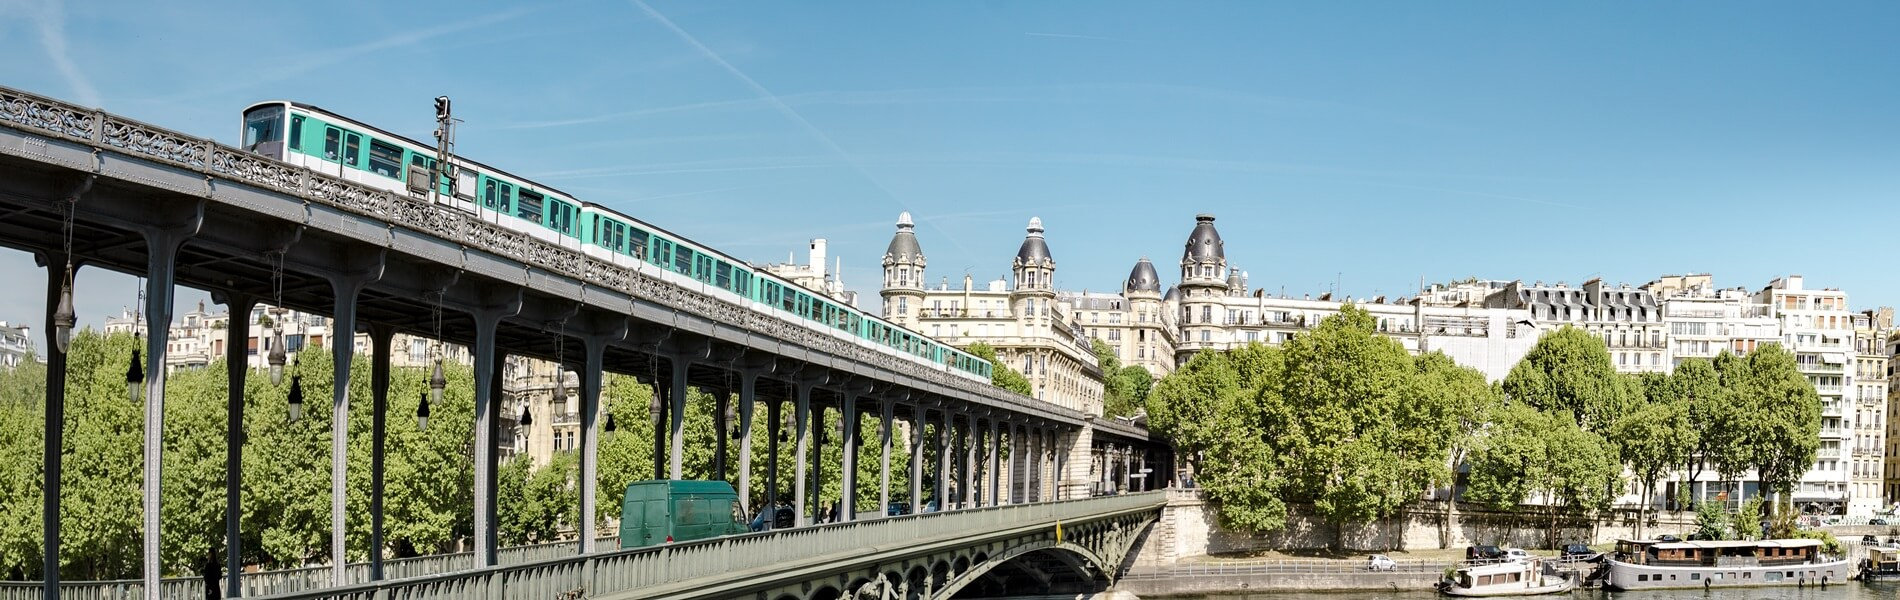 Grand Paris Express: Europas größtes Infrastrukturprojekt